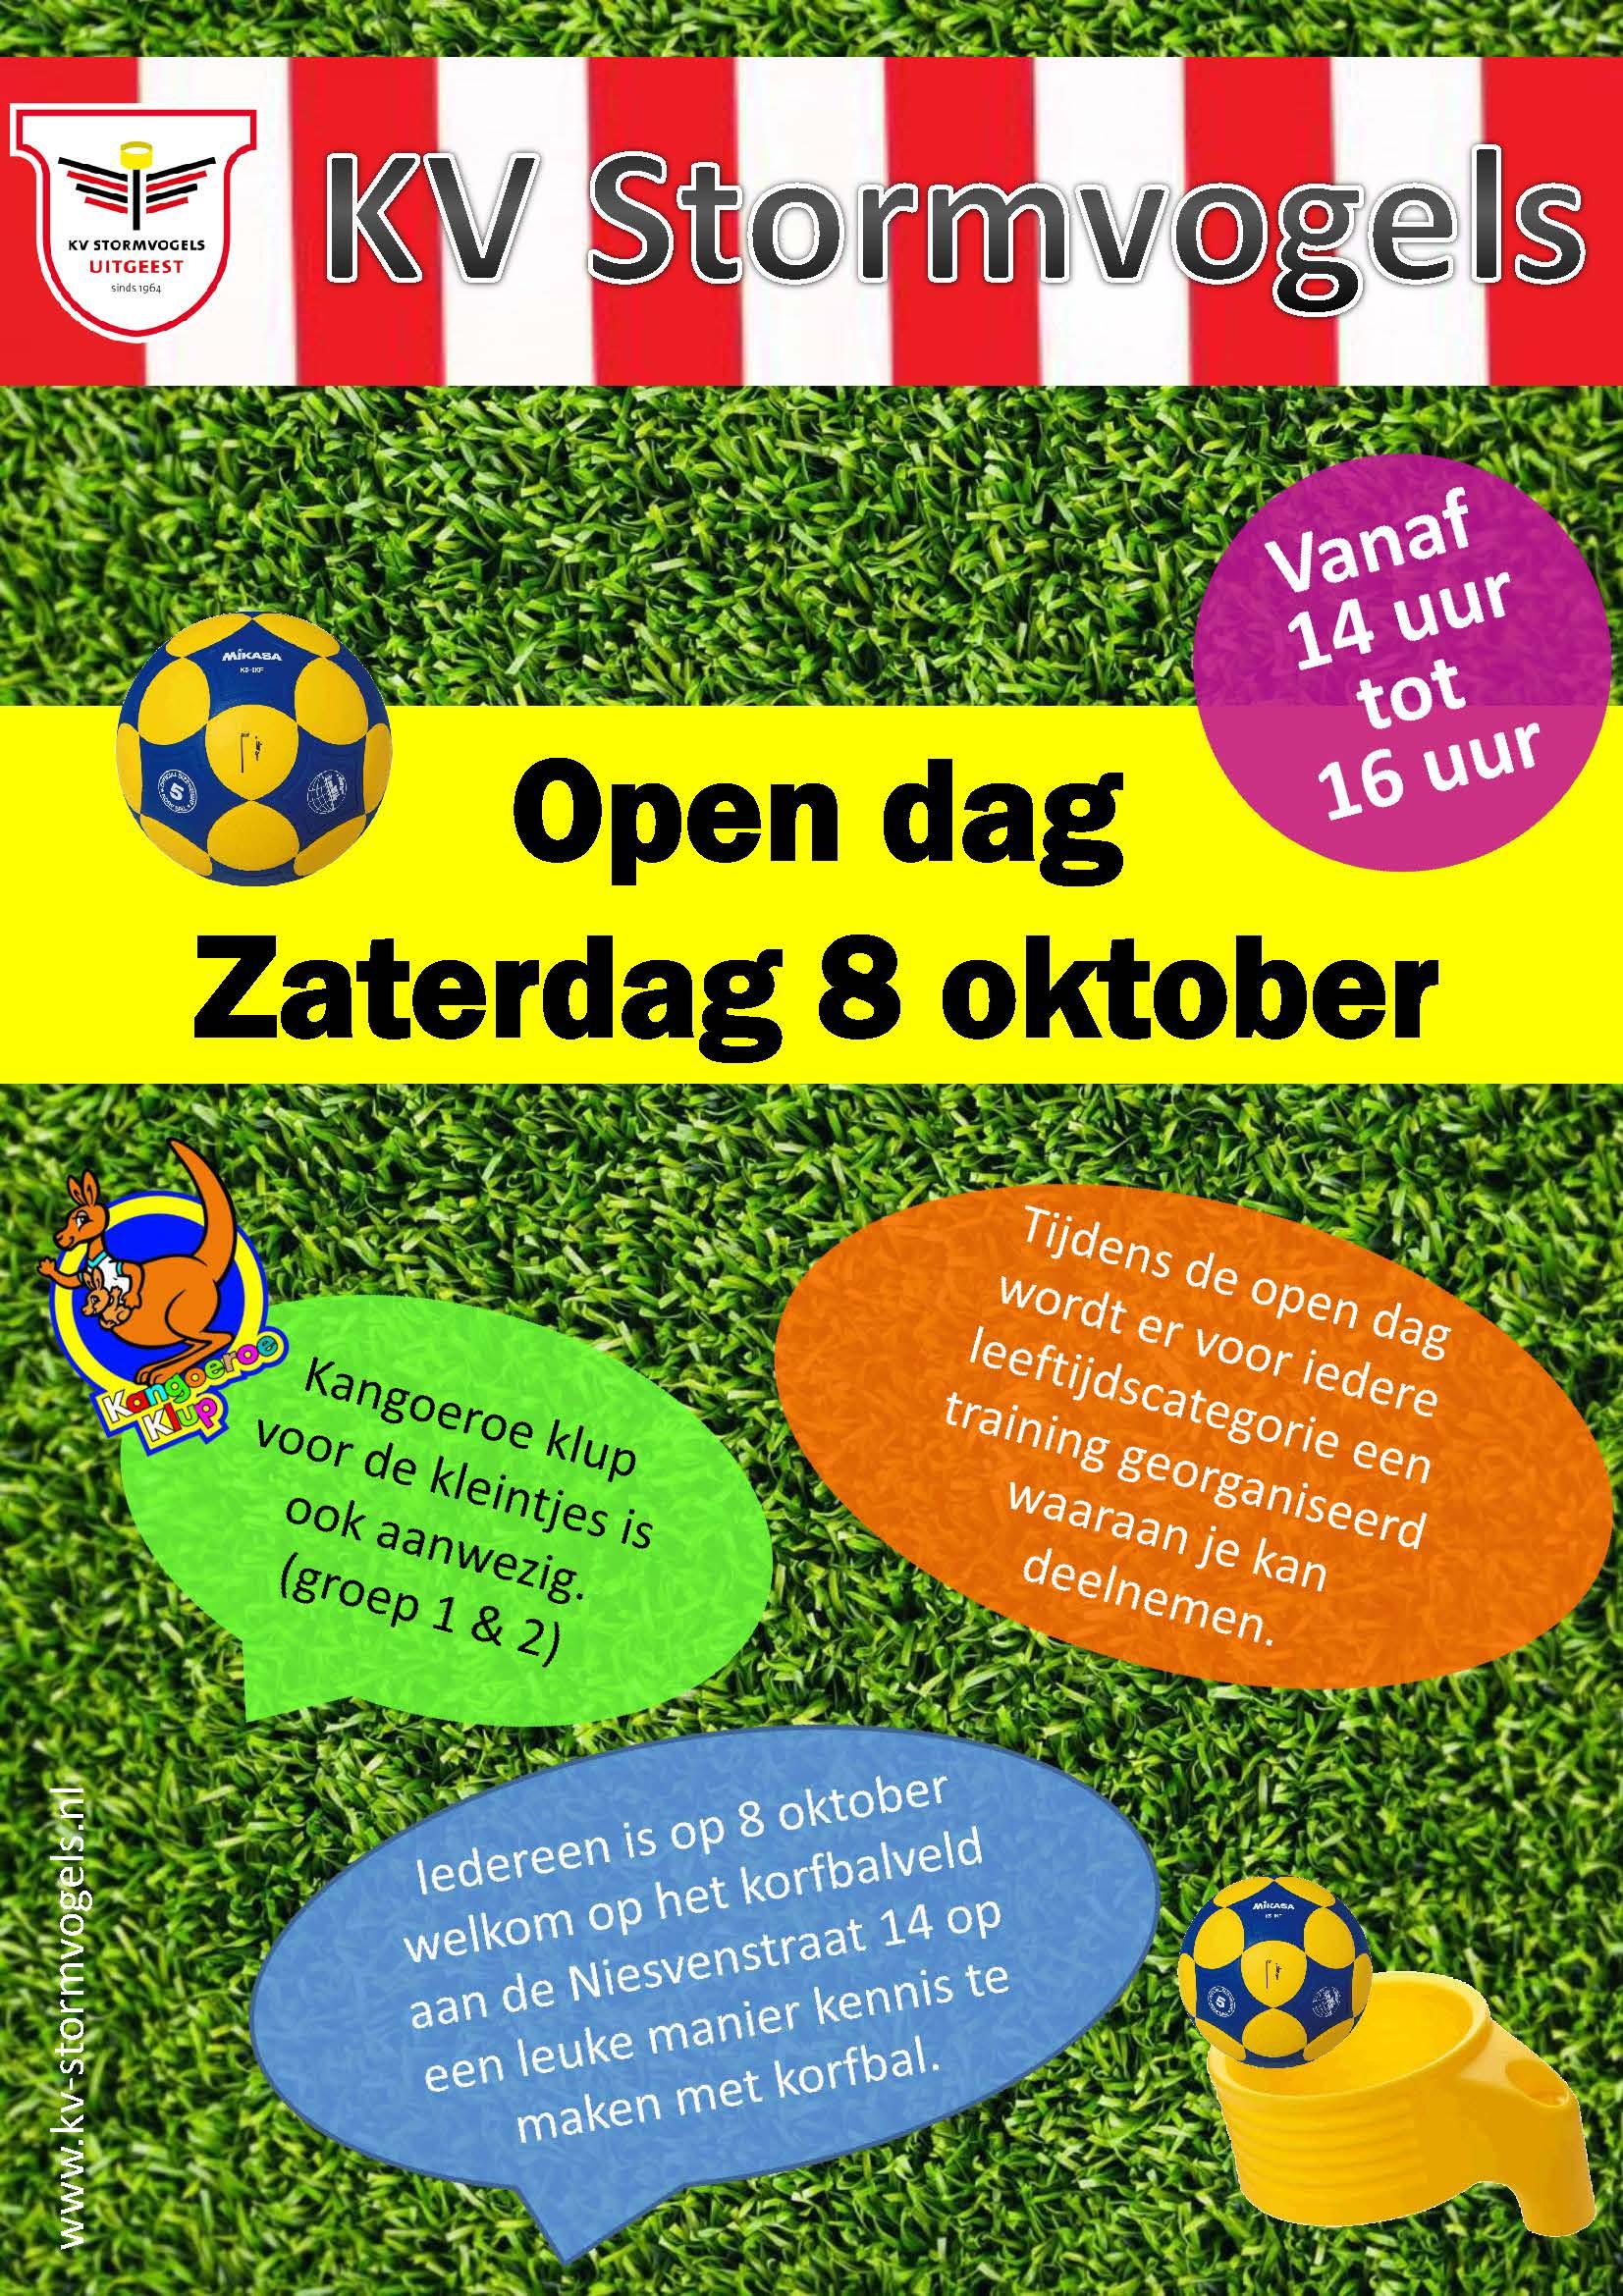 Open dag zaterdag 8 oktober.